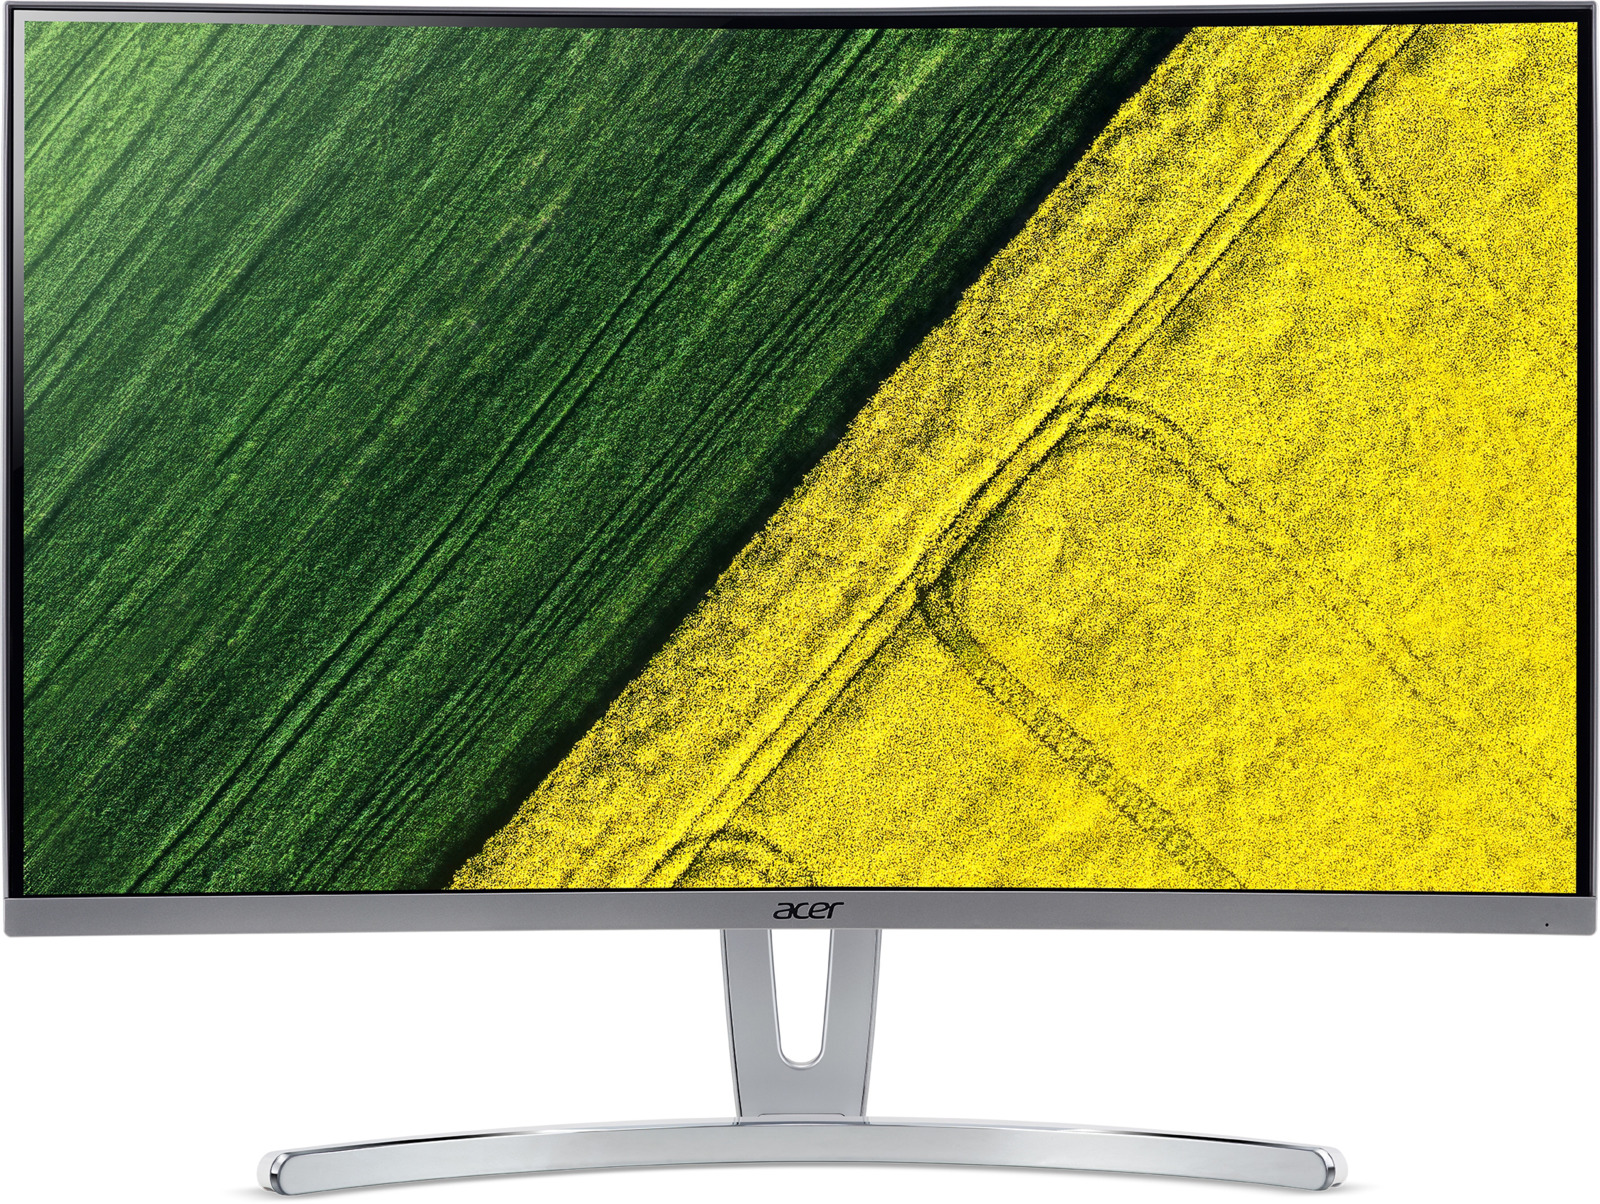 Монитор Acer ED273Awidpx, белый монитор acer v226hqlab